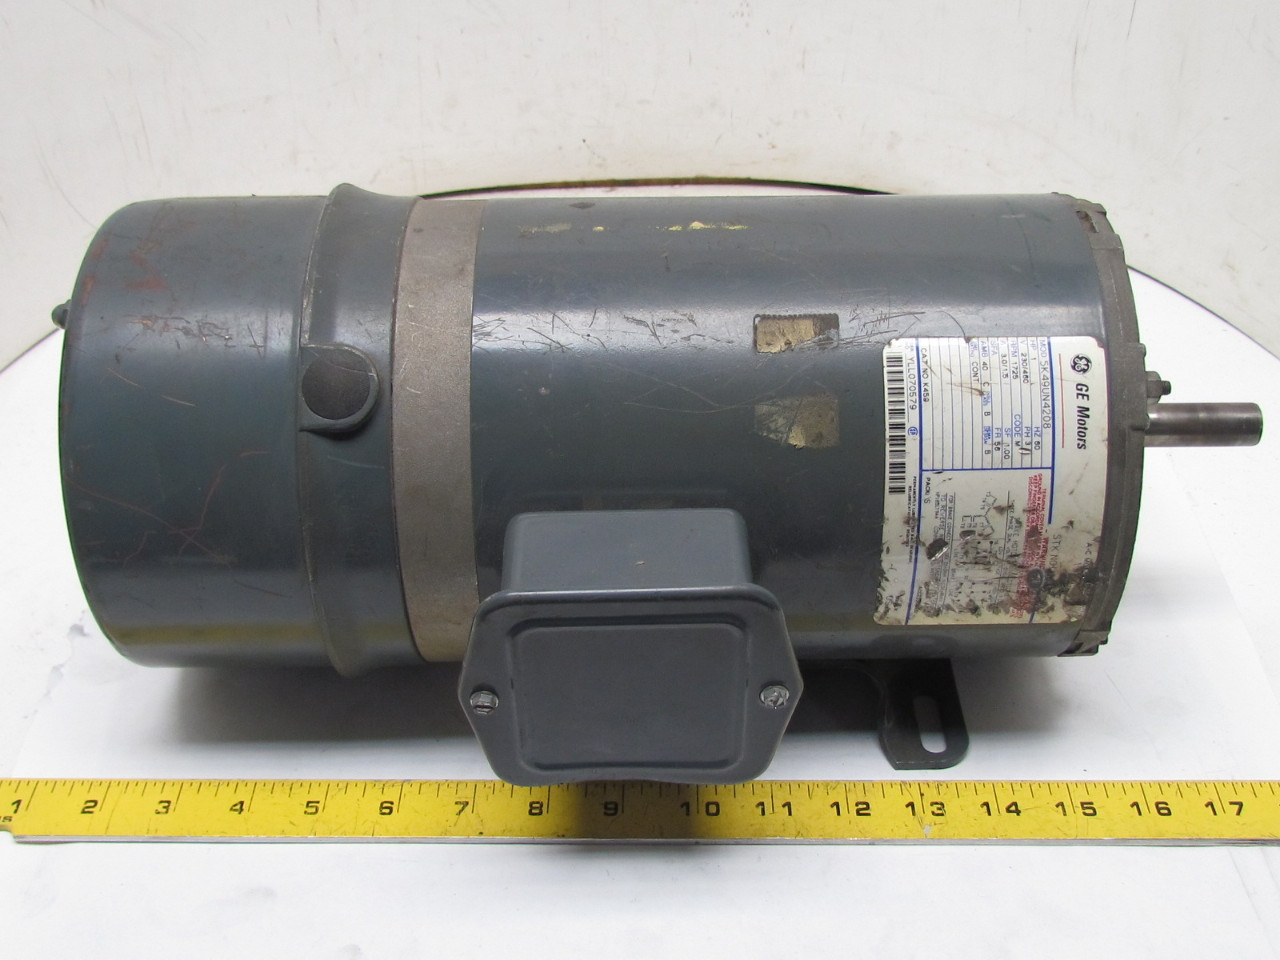 General electric 5k49un 4208 3ph motor k459 1hp 1725 rpm for Electrical braking of dc motor